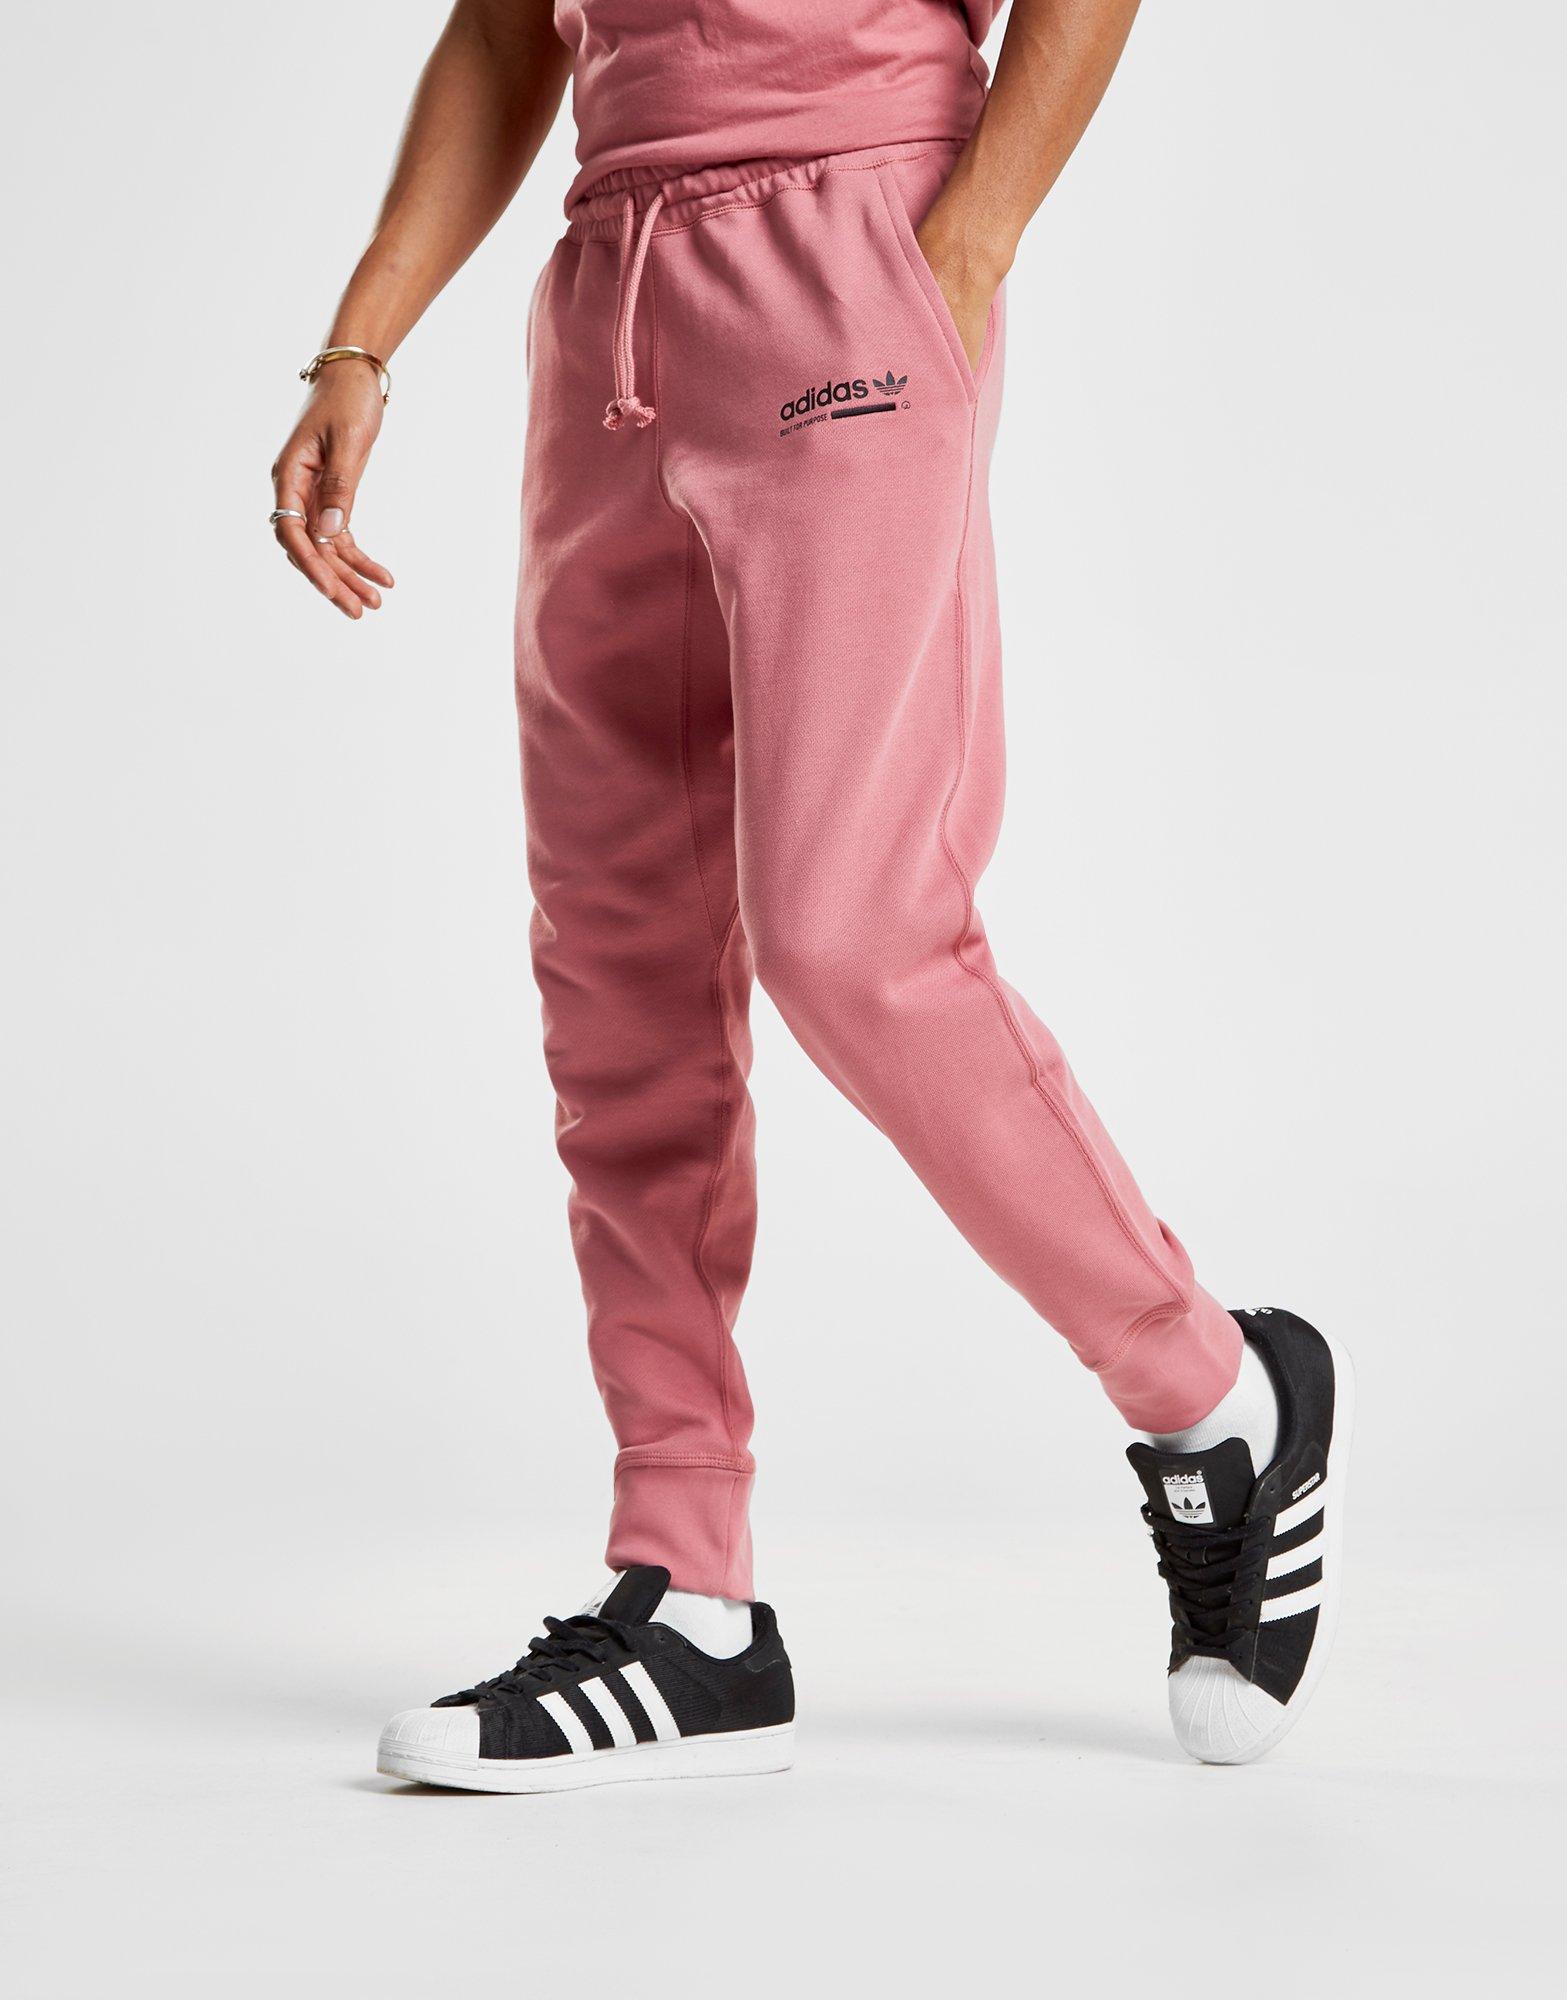 795dde6ff48 adidas Originals Kaval Cuffed Fleece Pants in Pink for Men - Lyst